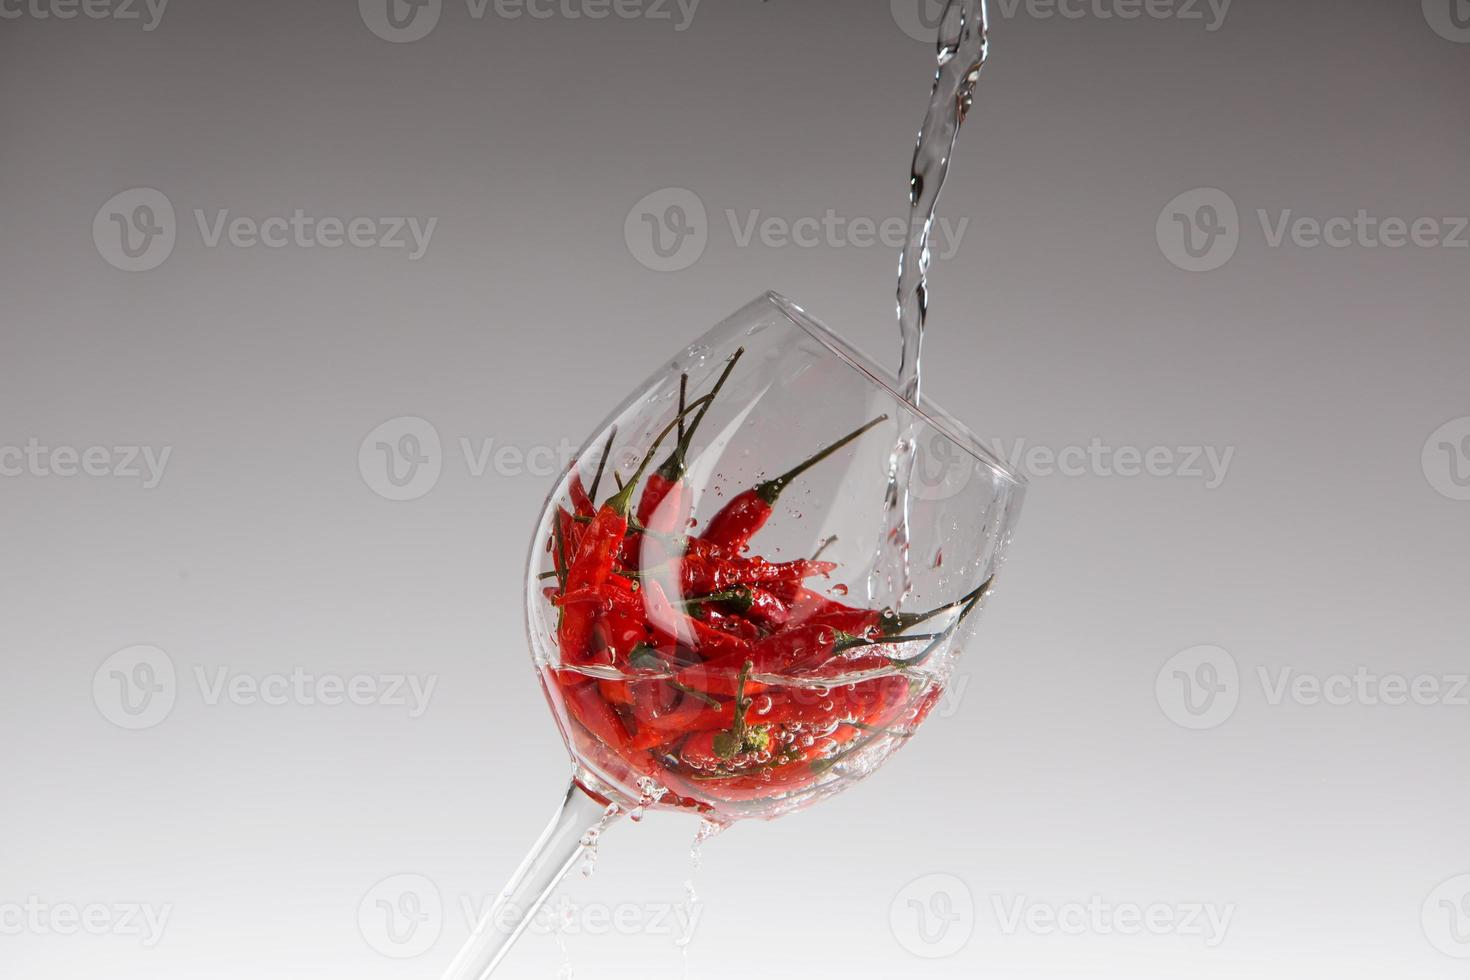 Red hot chili pepper in a glass photo